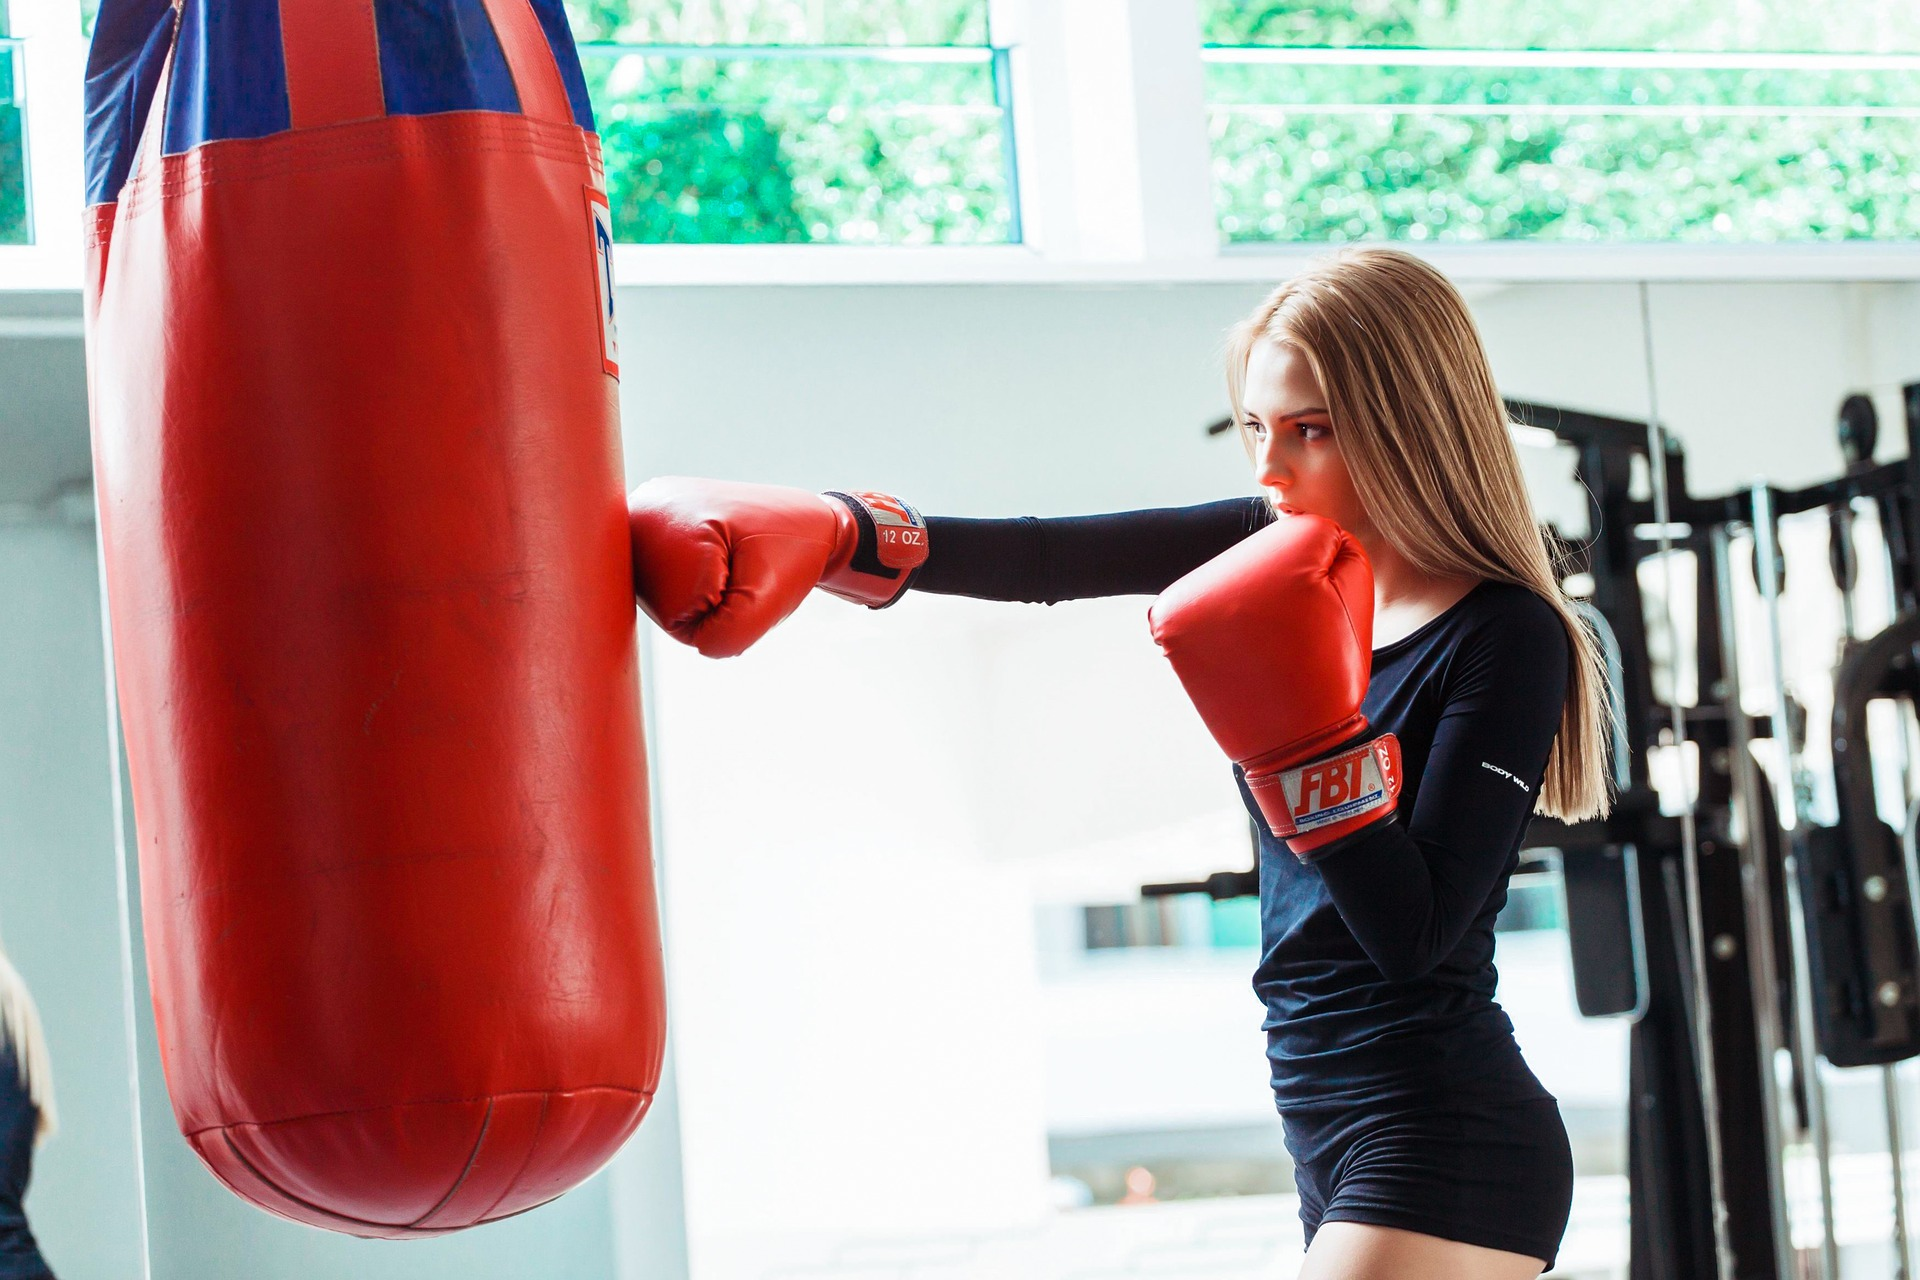 Mulher treinando boxe no saco.